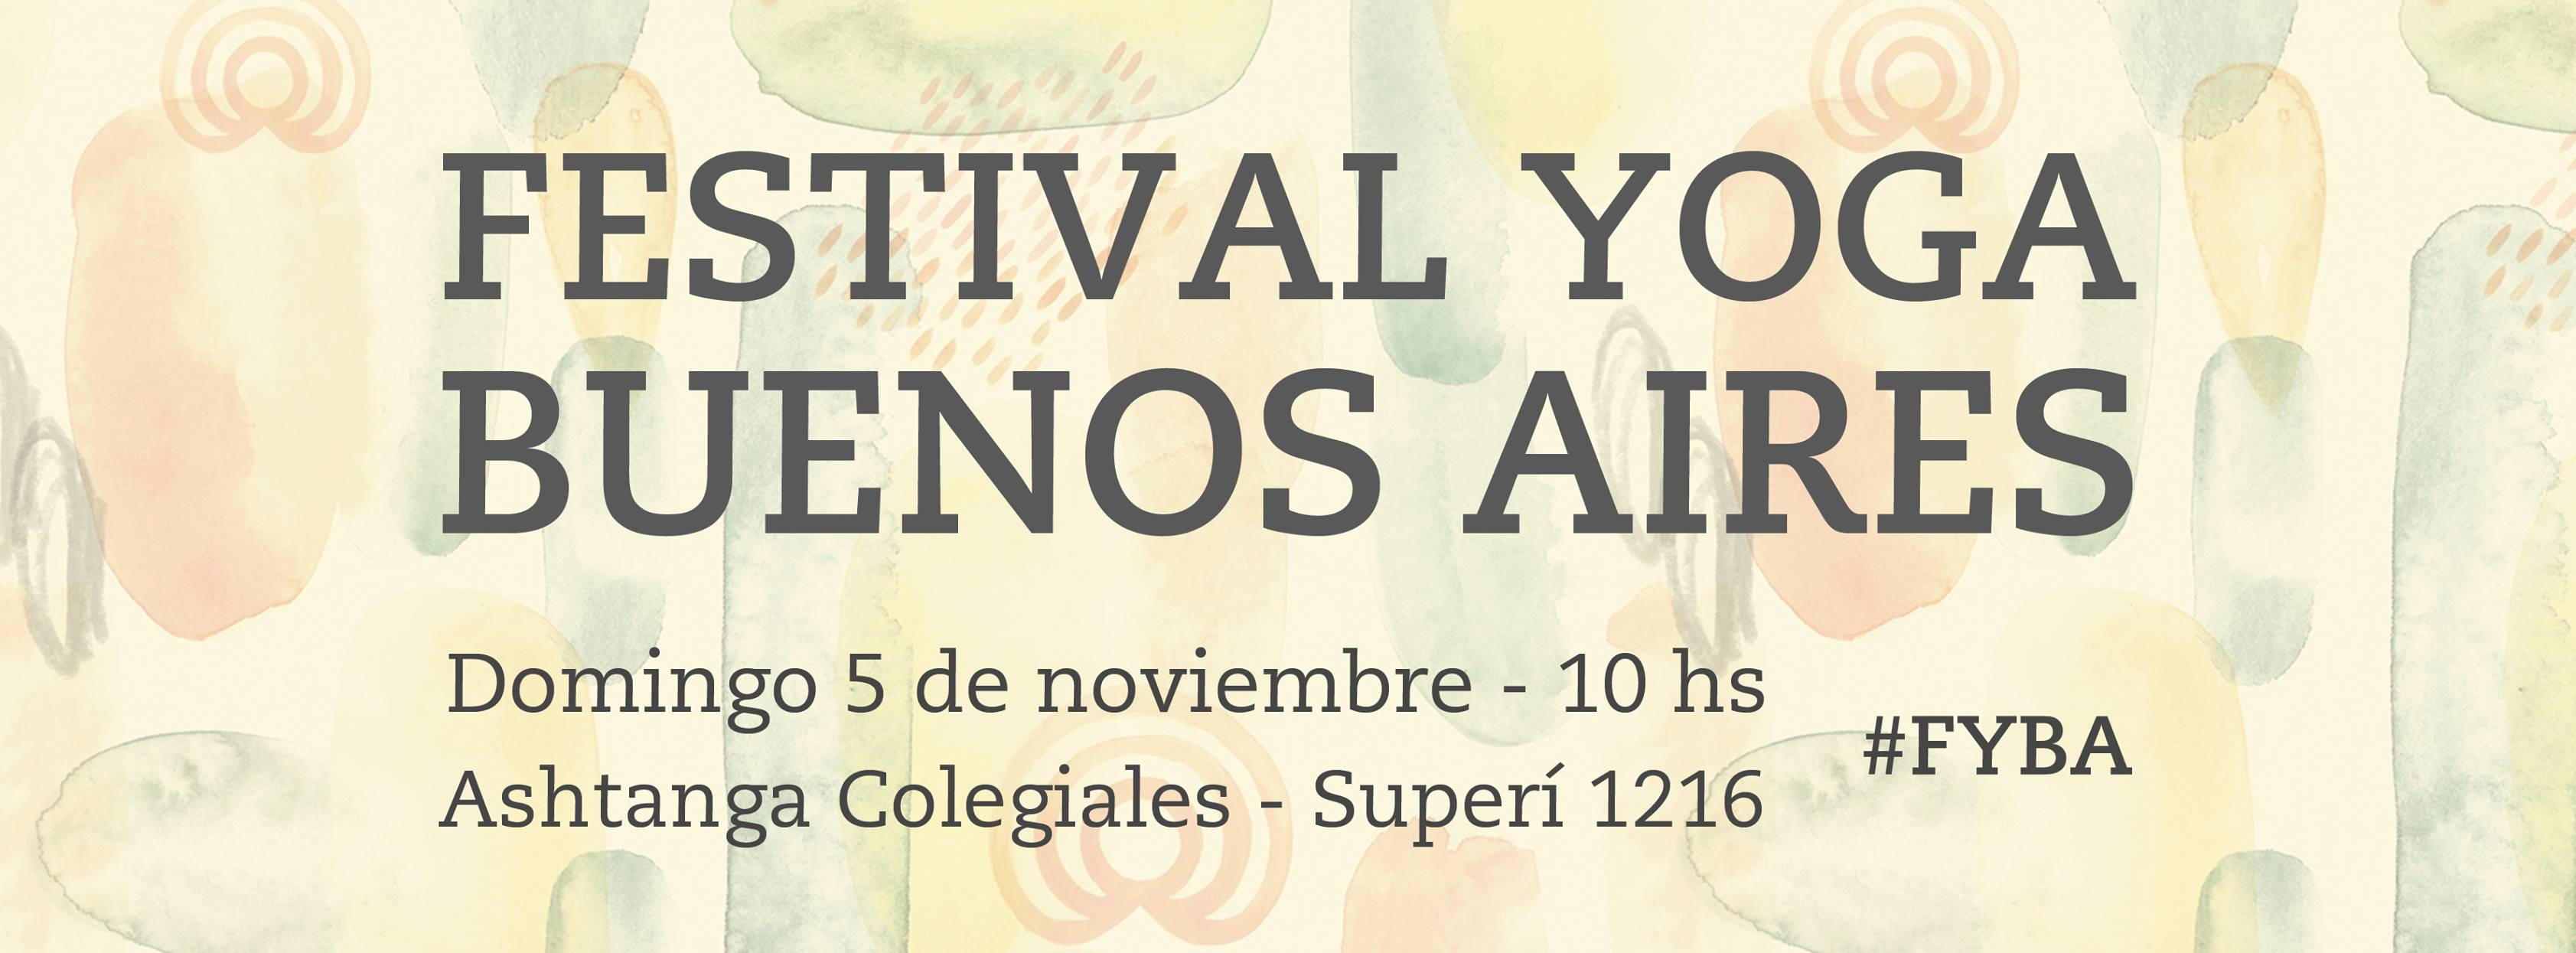 Festival de Yoga en Buenos Aires